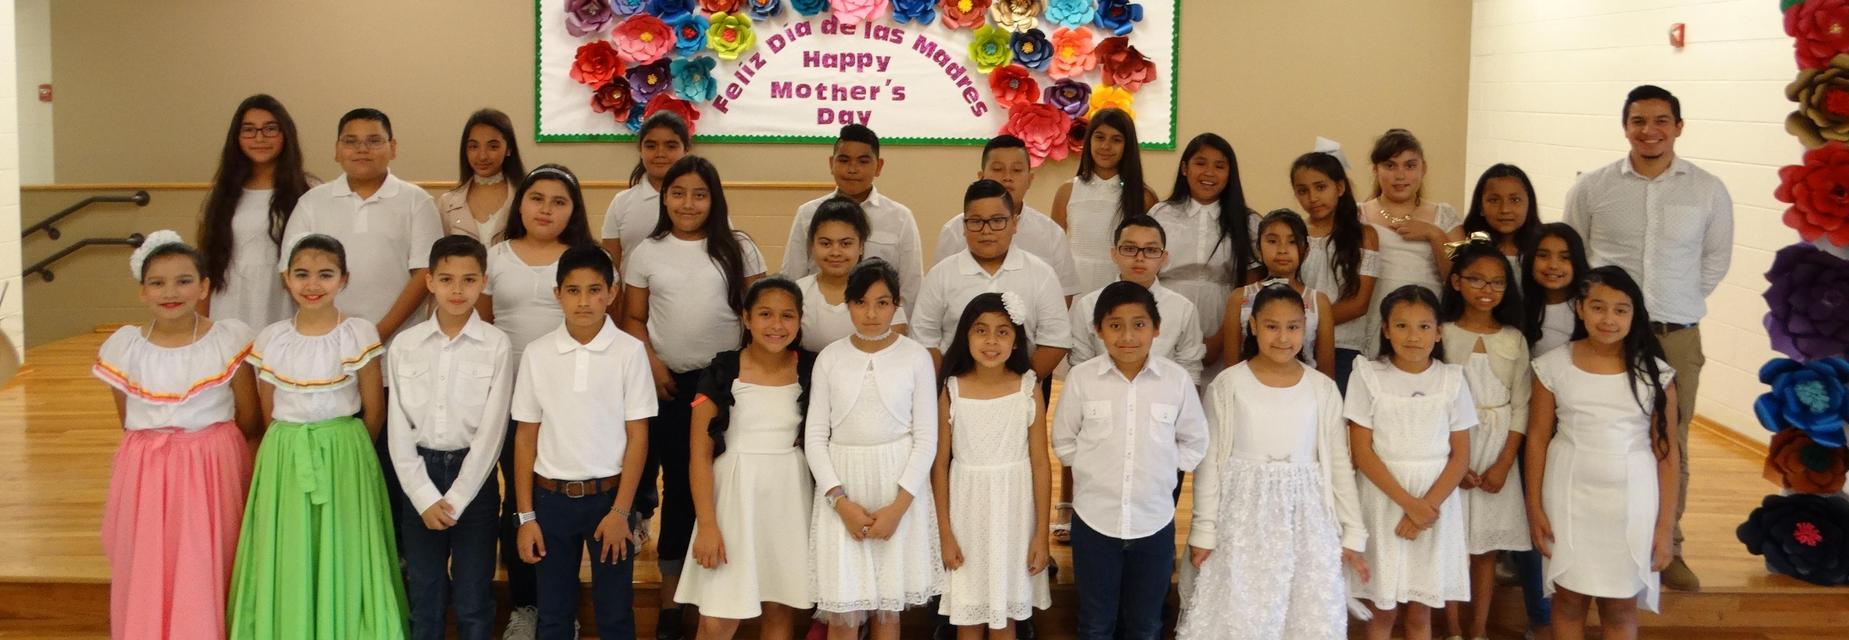 Choir group with Mr. Gonzalez